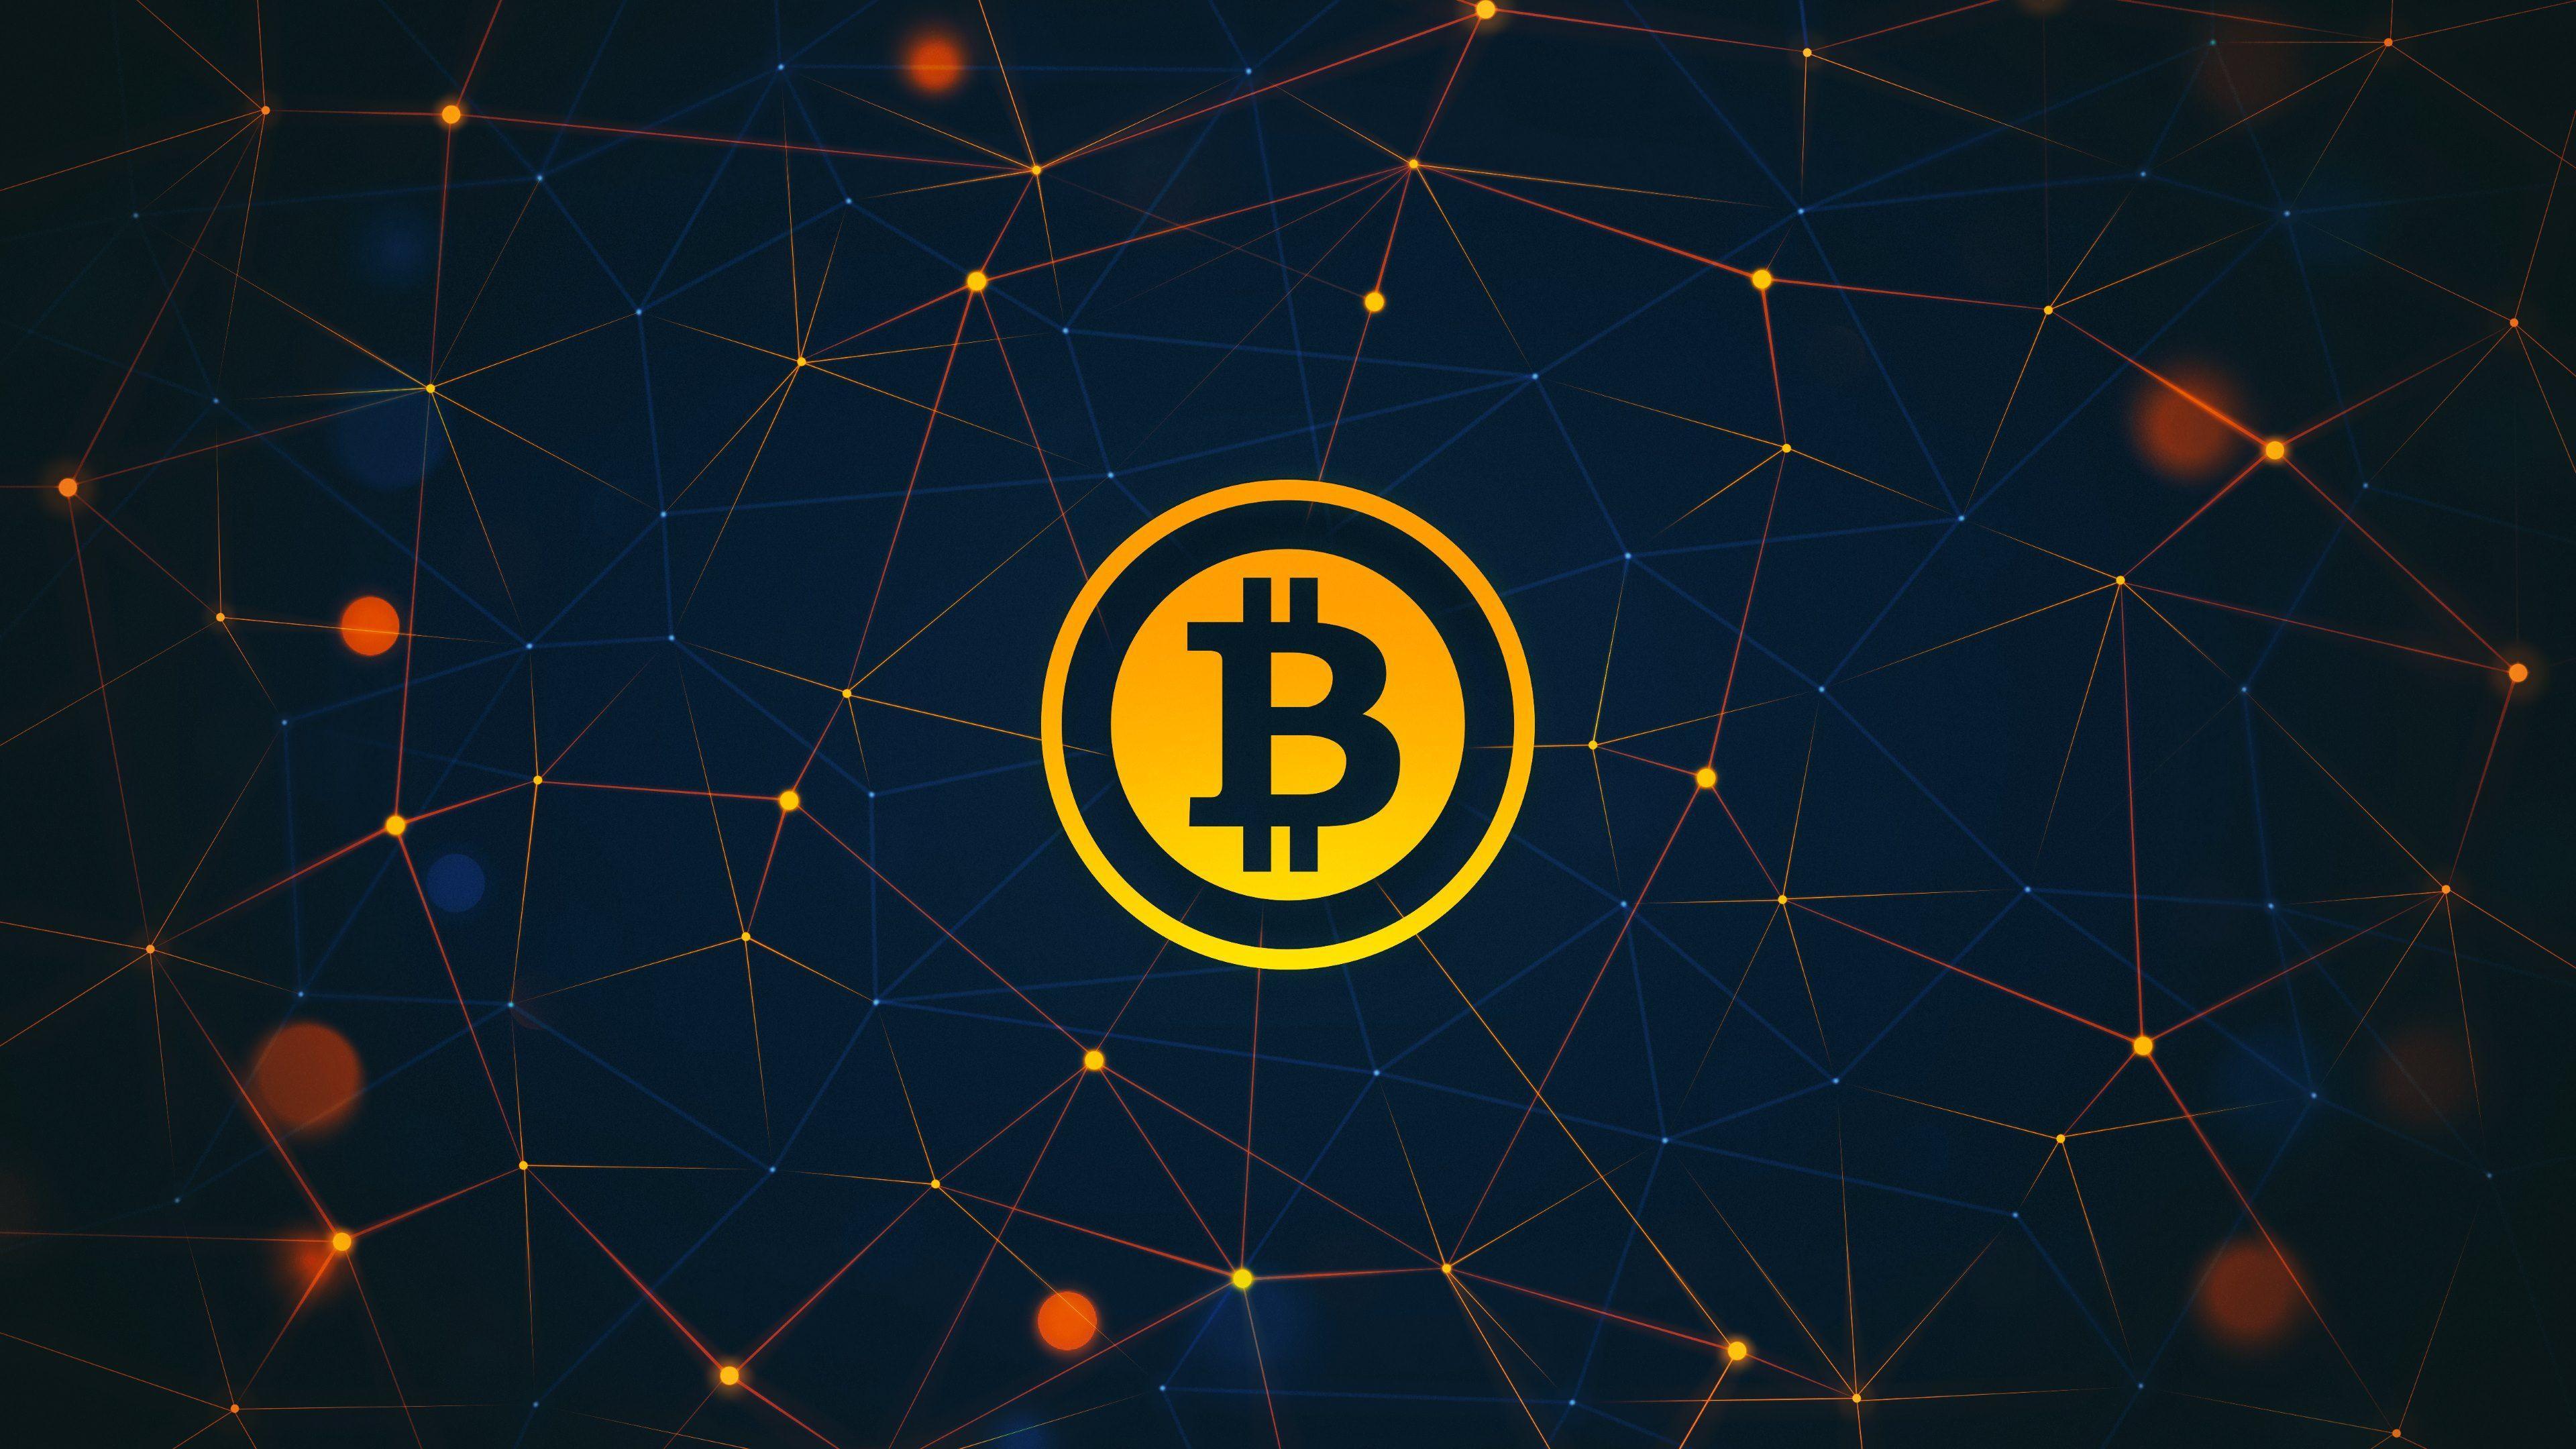 4K Bitcoin Wallpapers   Top 4K Bitcoin Backgrounds 3840x2160